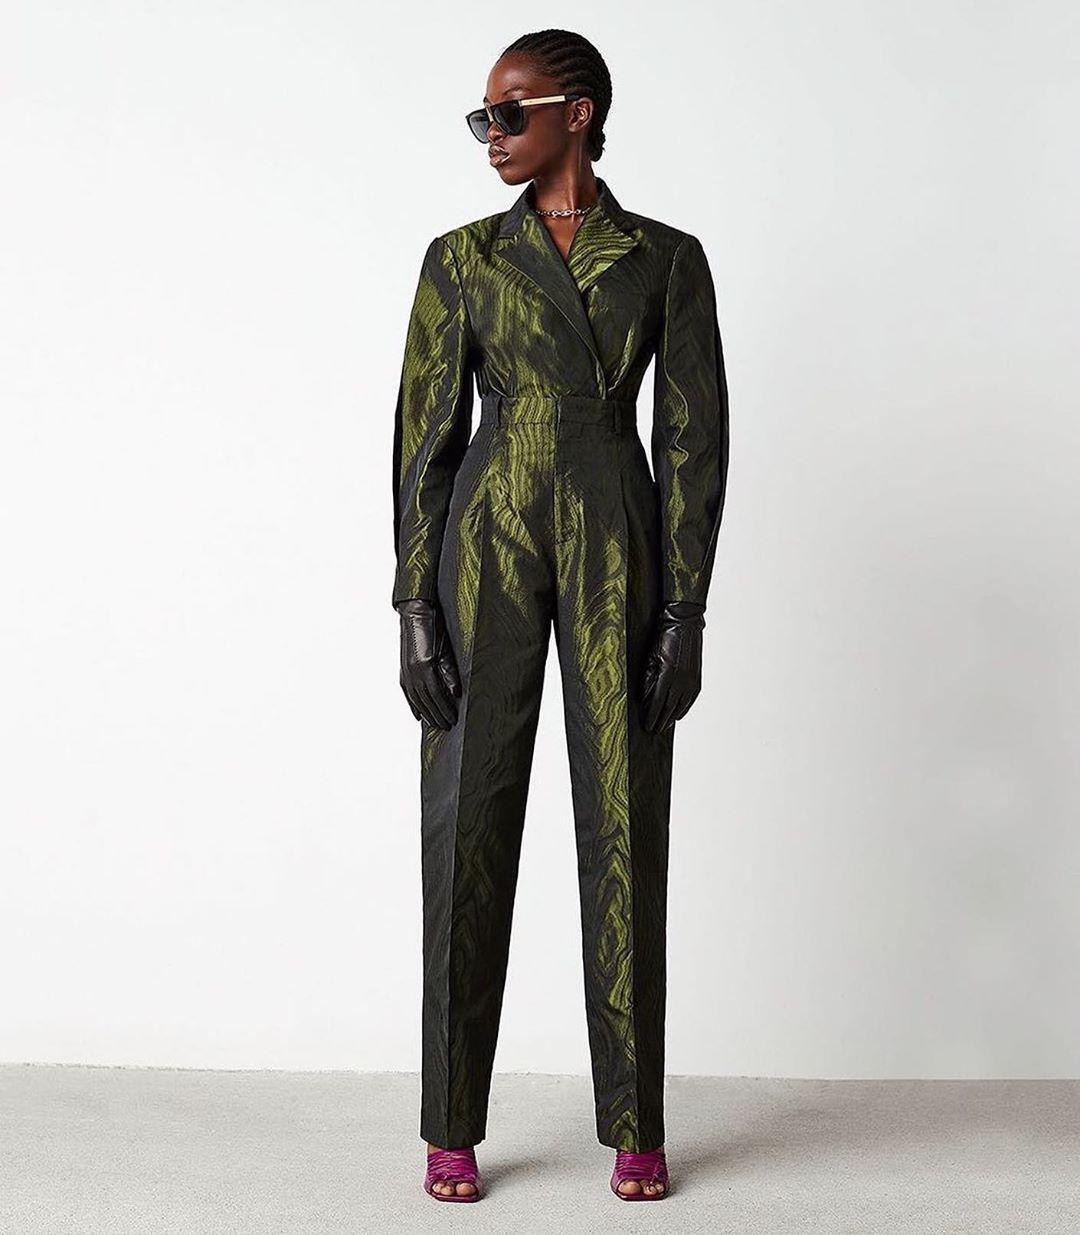 Chizoba Emmanuel Nigeria New African Models 2020